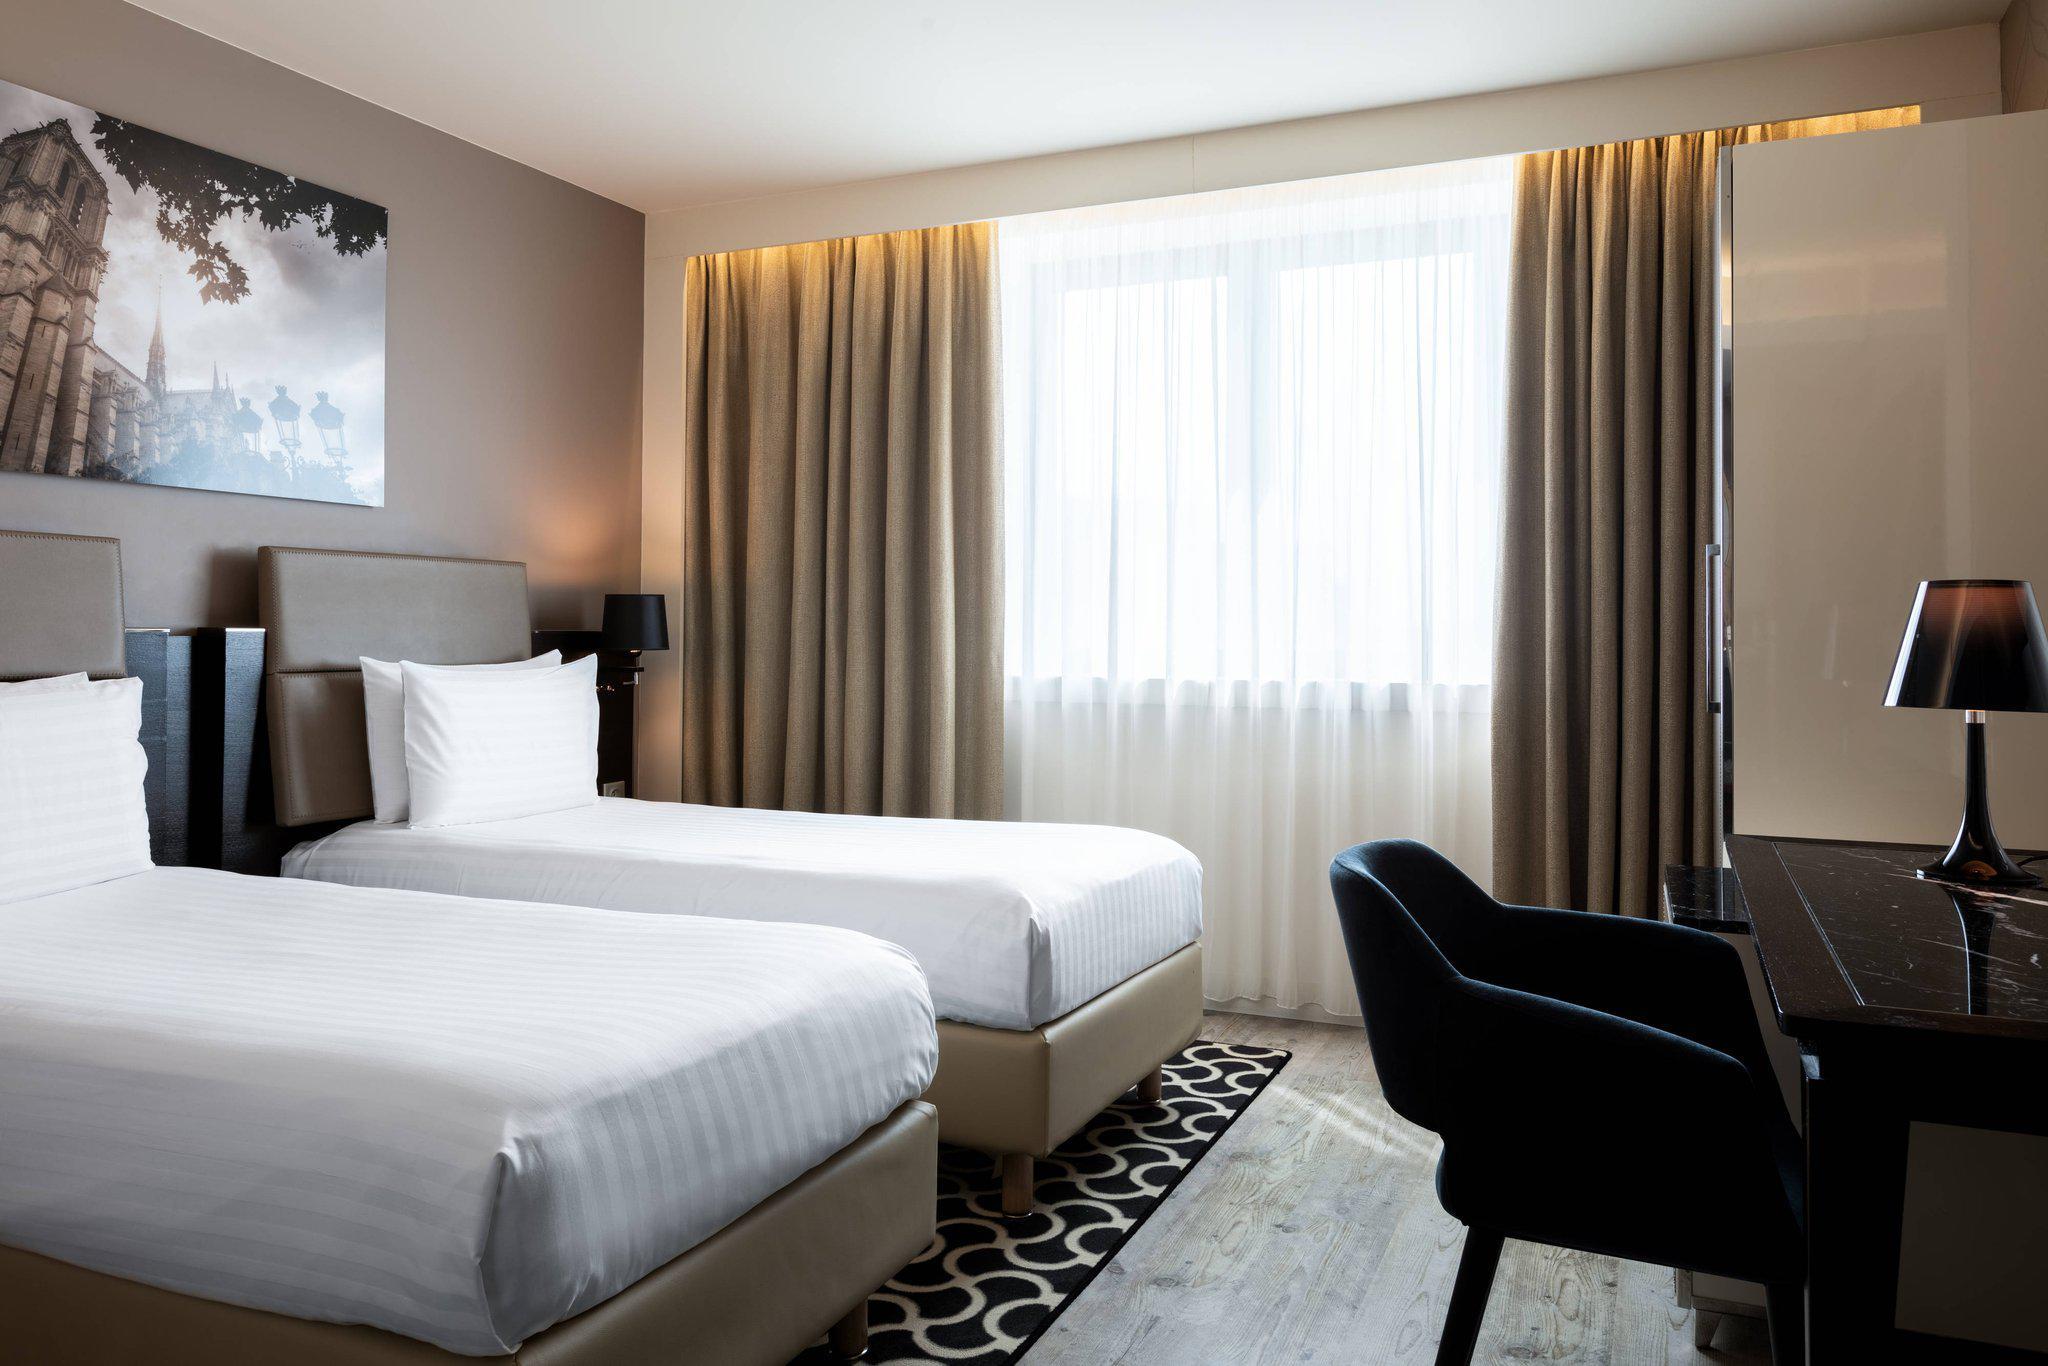 AC Hotel by Marriott Paris Porte Maillot